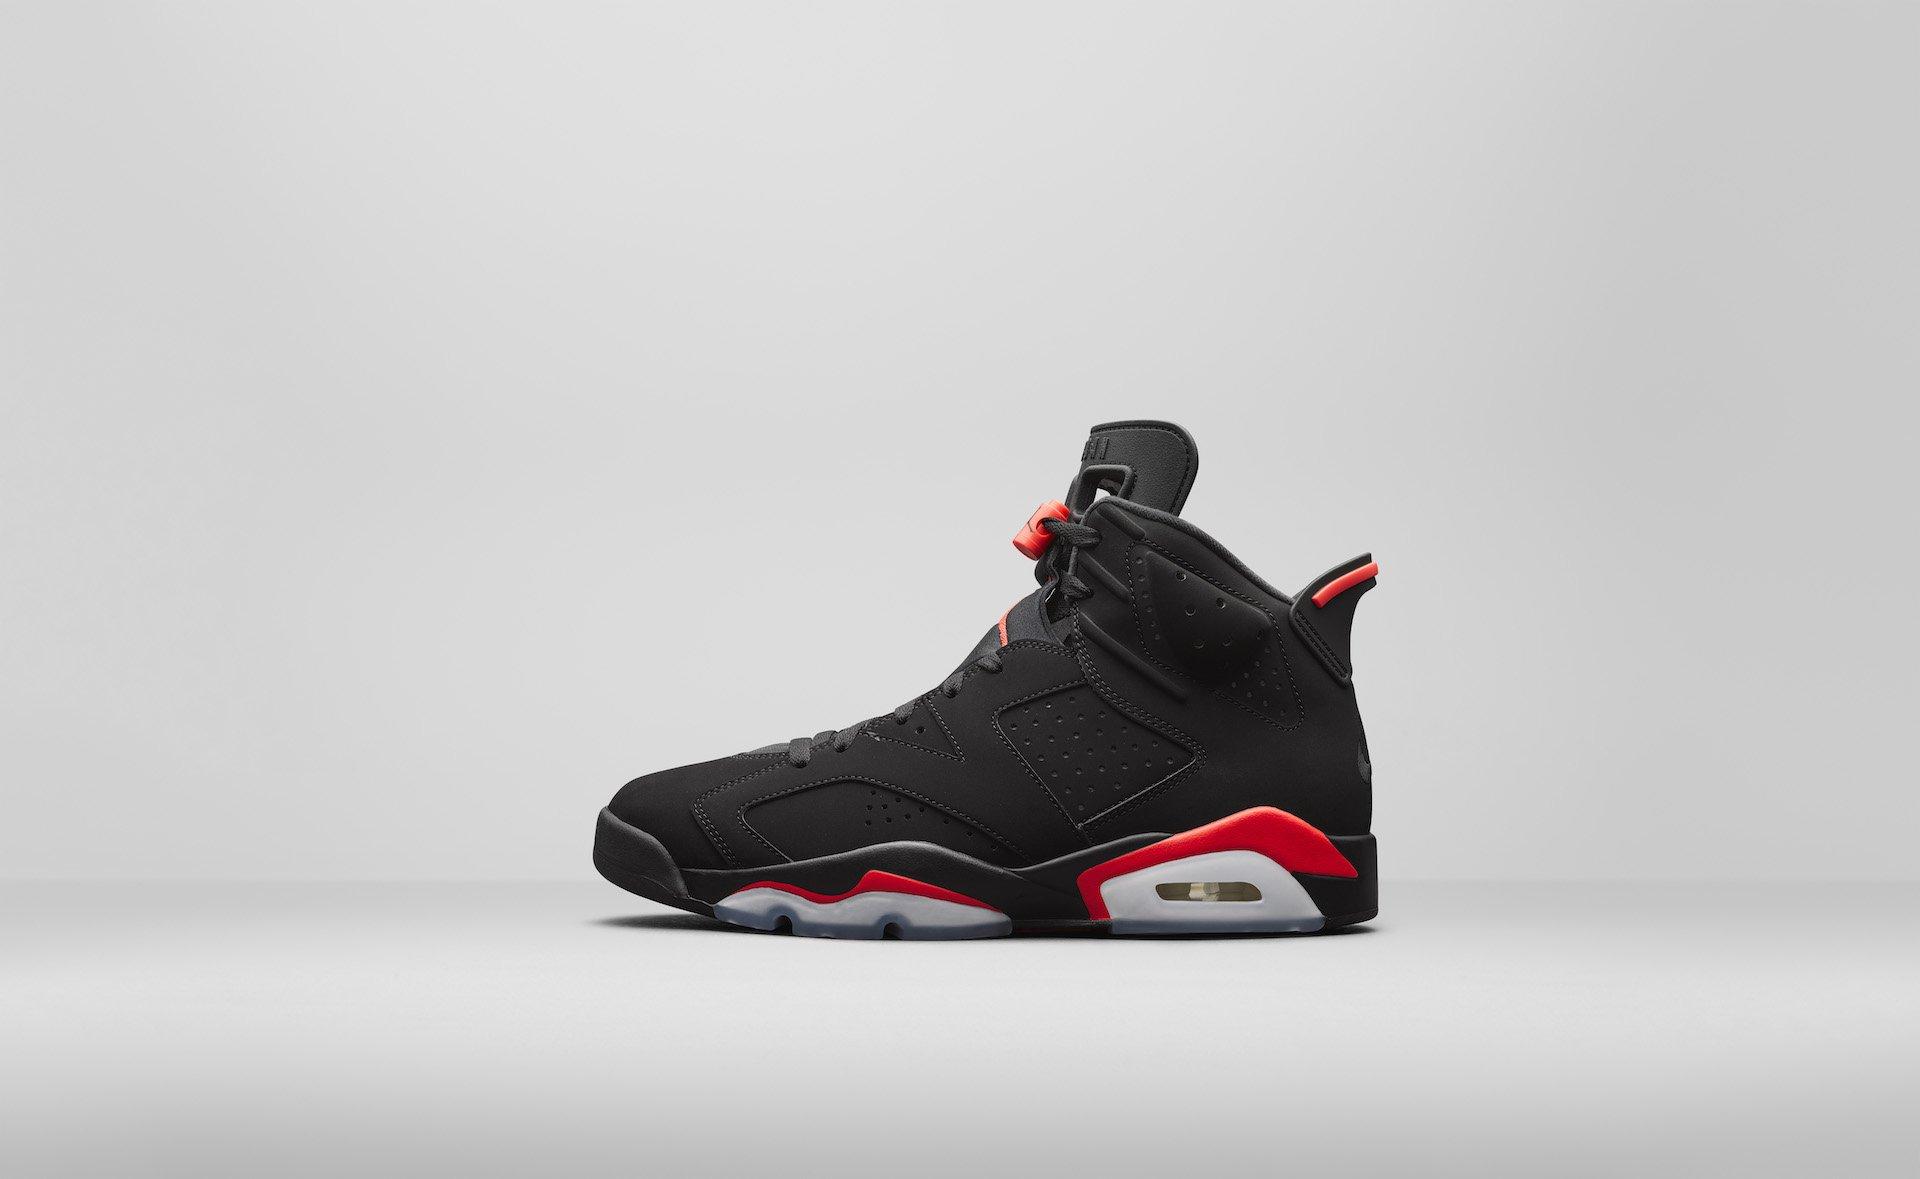 the best attitude c1a62 ed6b0 Jordan VI Black Infrared 2019   I Love Sneakers